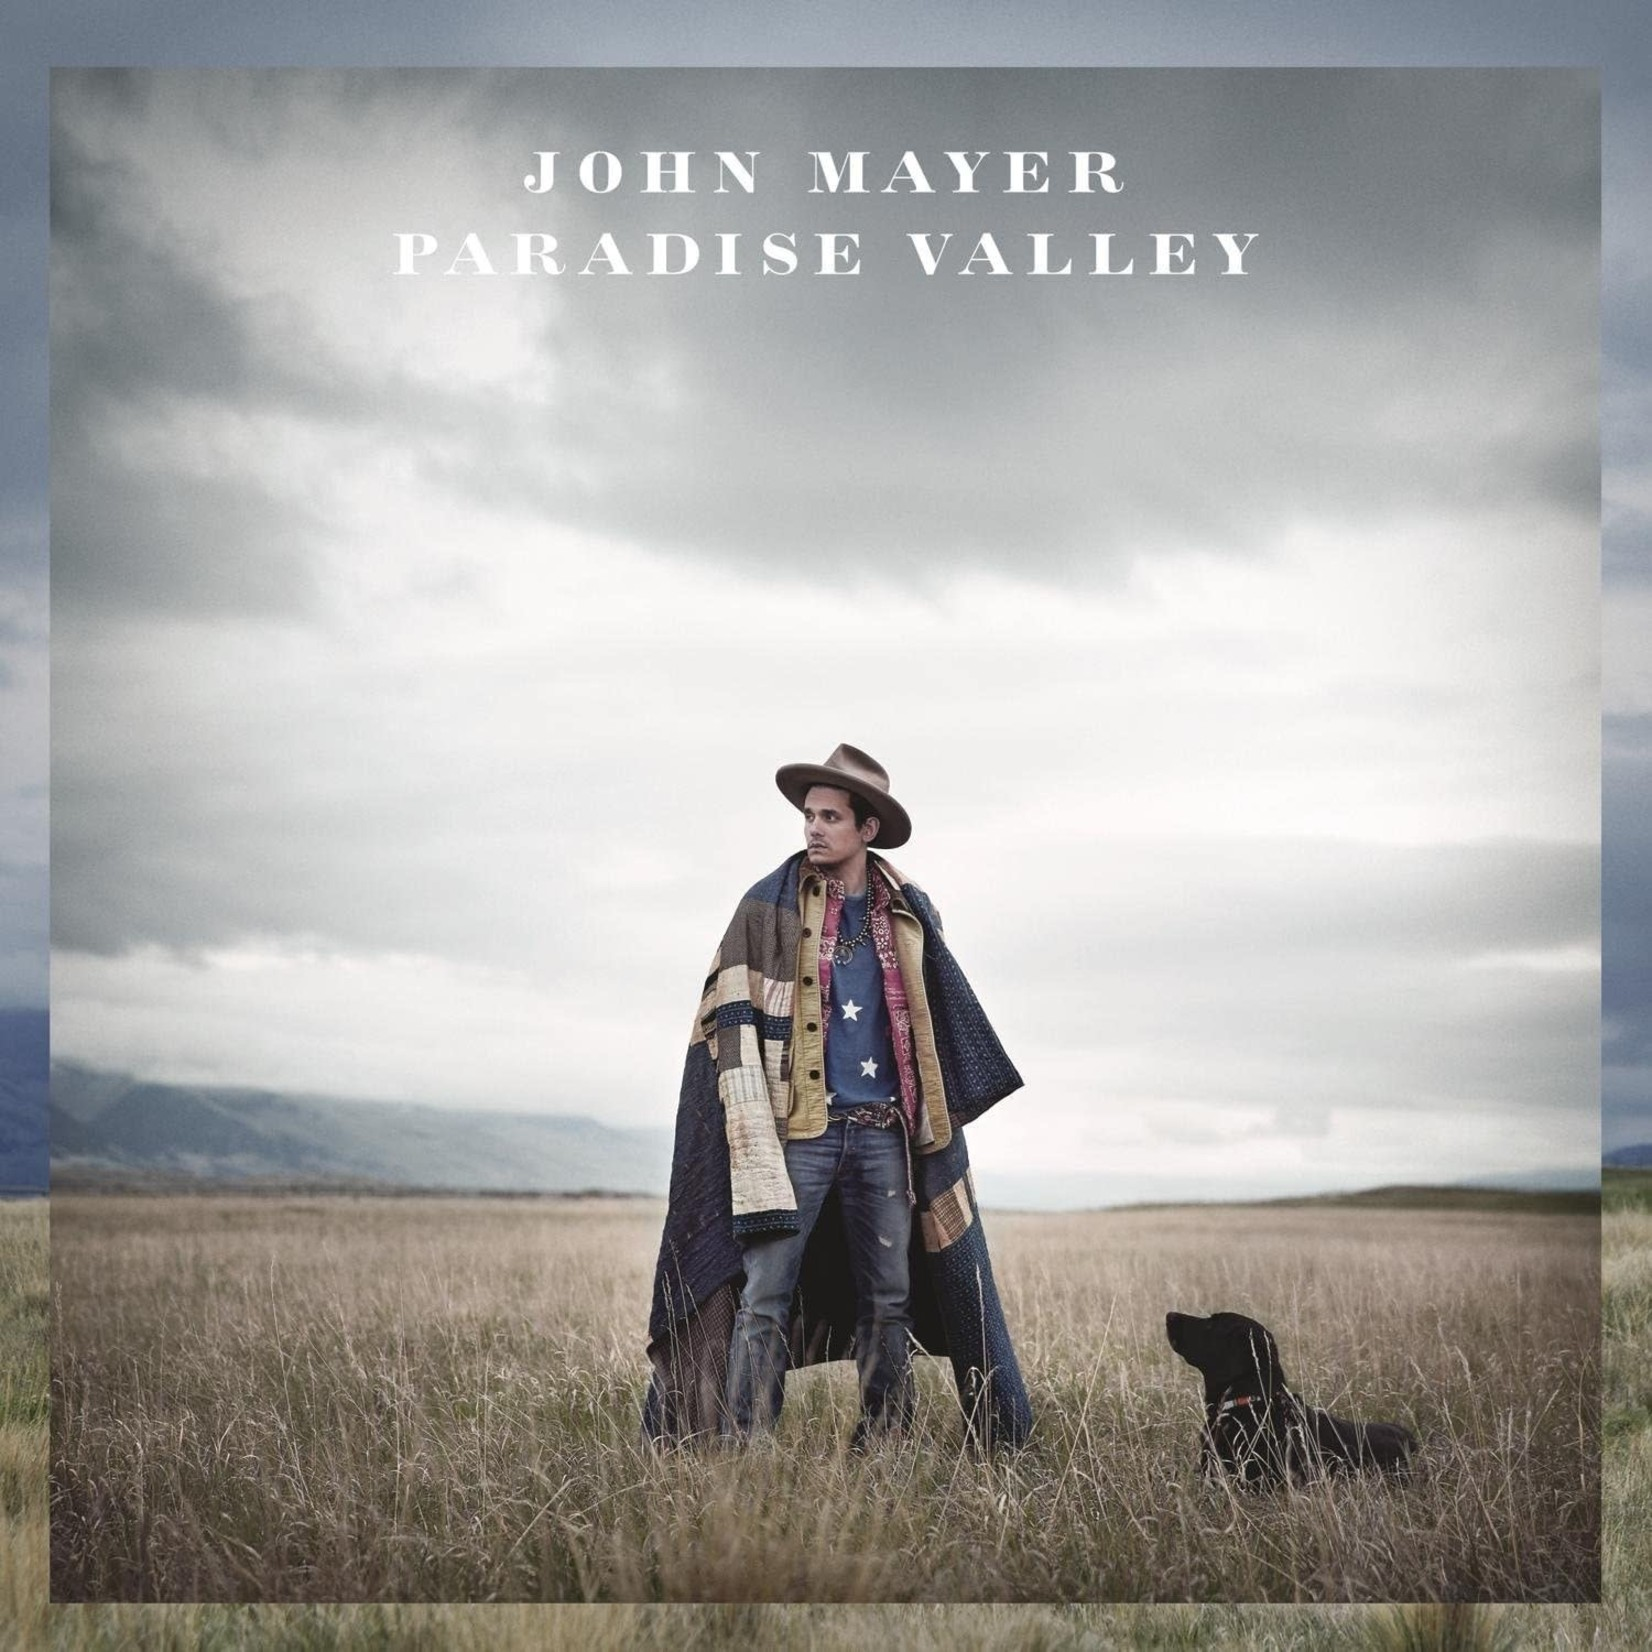 [New] Mayer, John: Paradise Valley